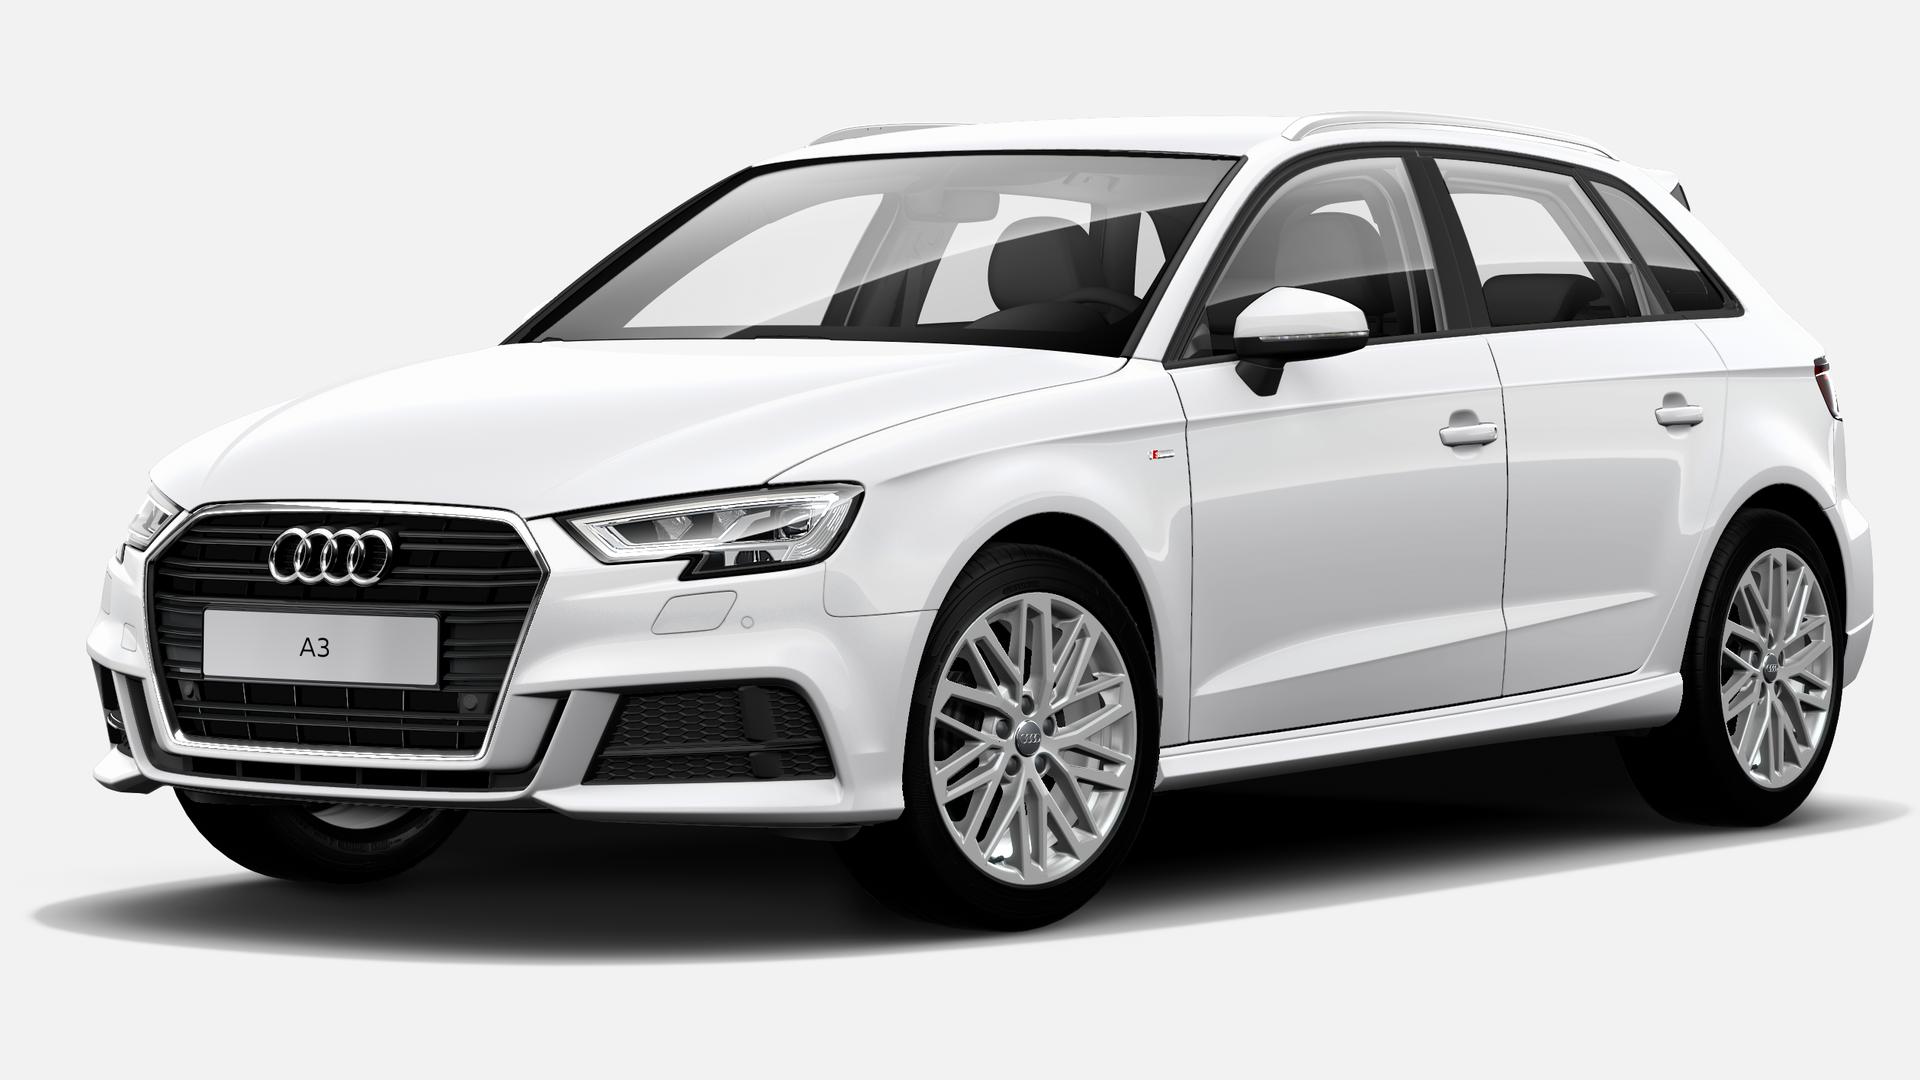 Audi A3 Sportback 30 TDI S line 85 kW (116 CV)  nuevo en Lugo